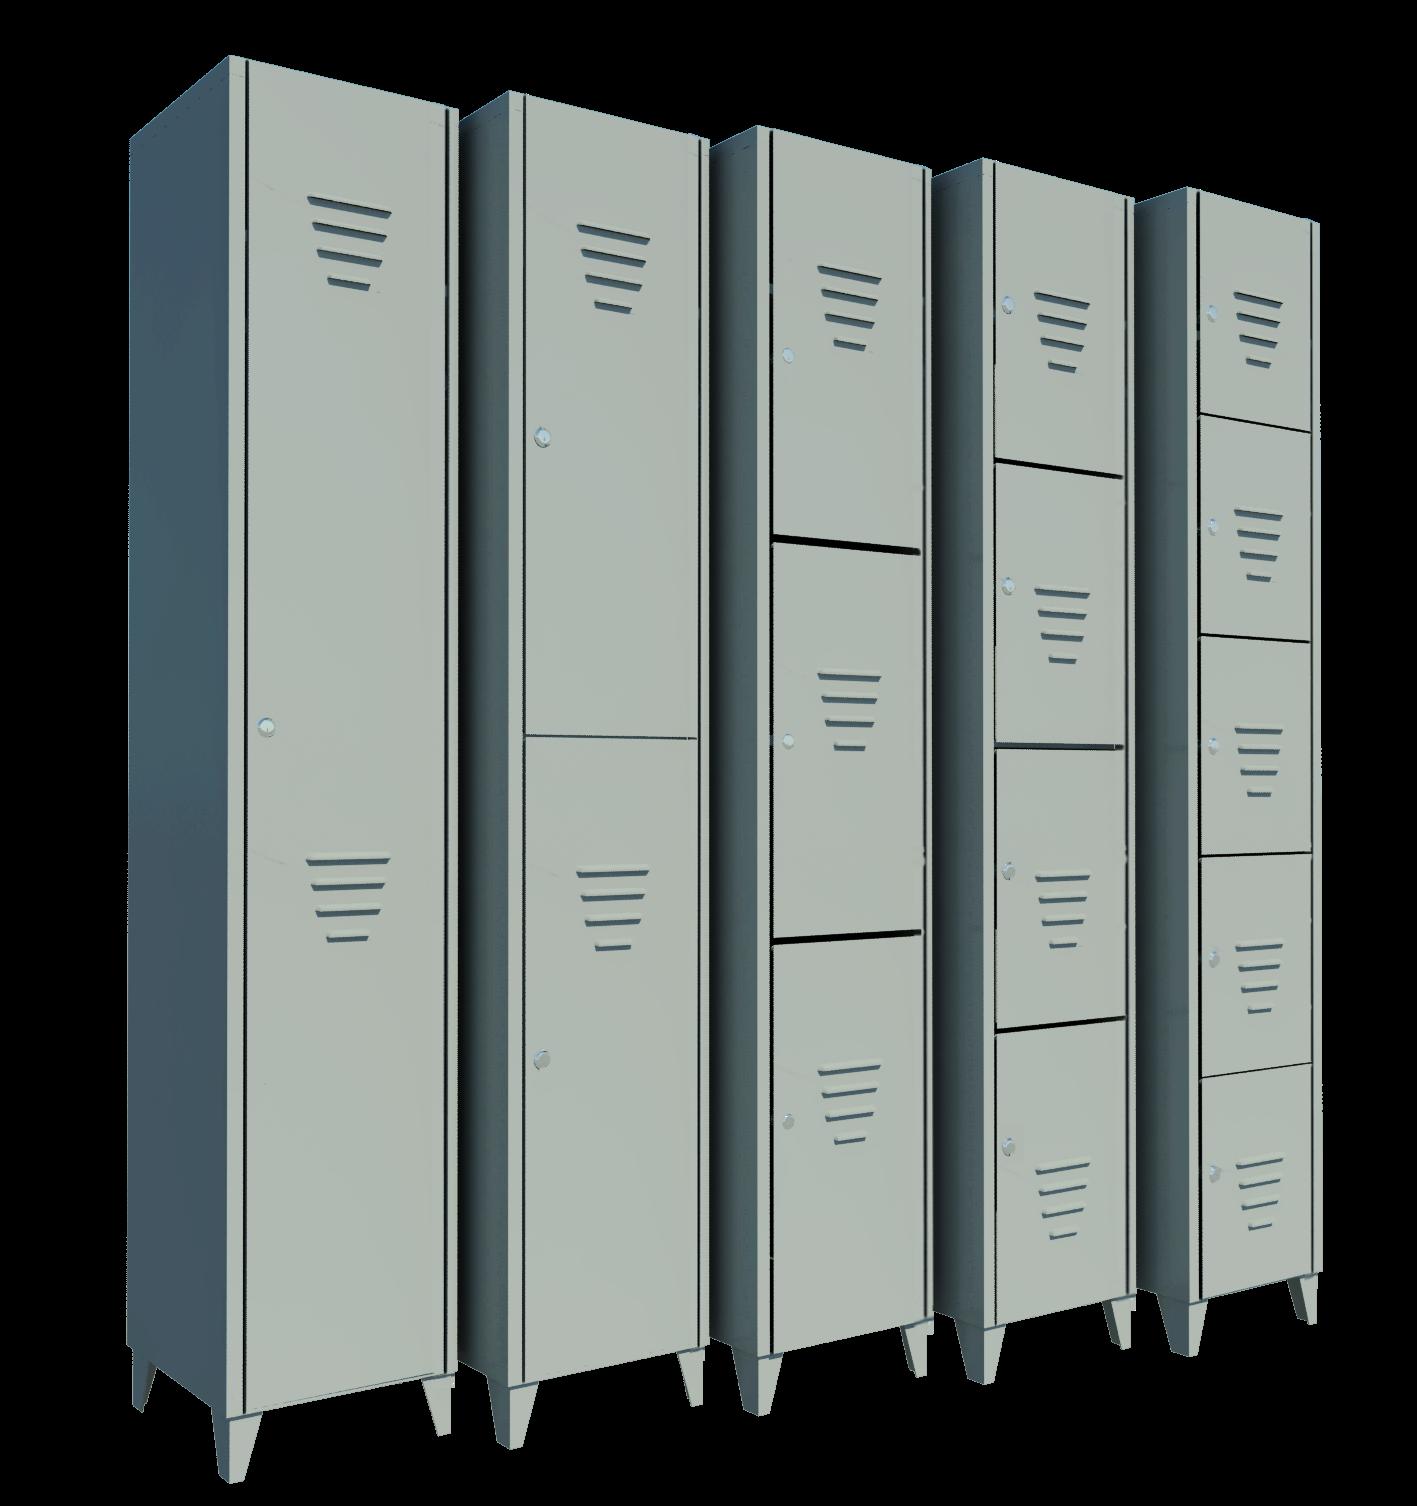 Muebles metalicos de dise o idea creativa della casa e for Diseno de muebles metalicos pdf